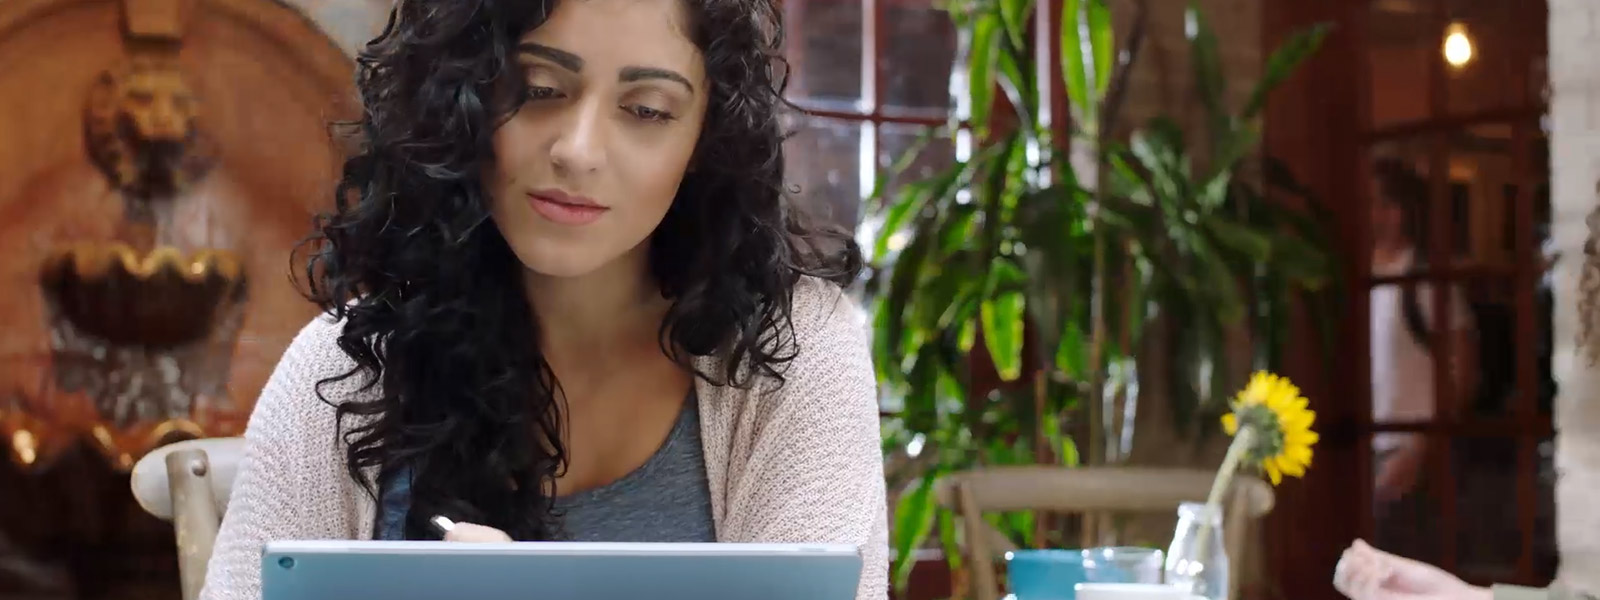 Écriture manuscrite Windows Ink sur Windows10